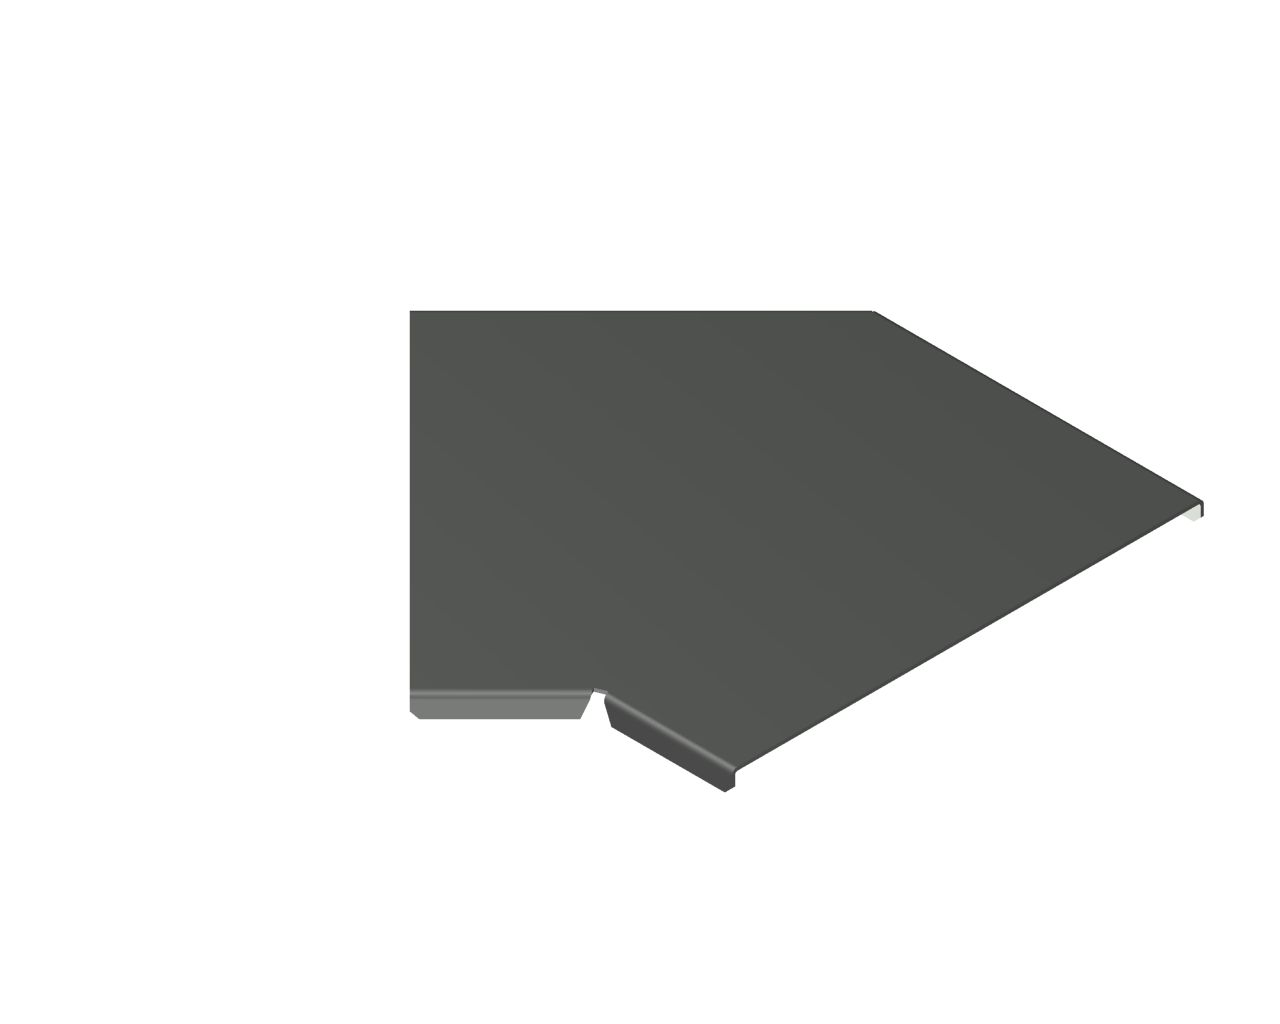 Pokrywa kolanka 45° PKK45